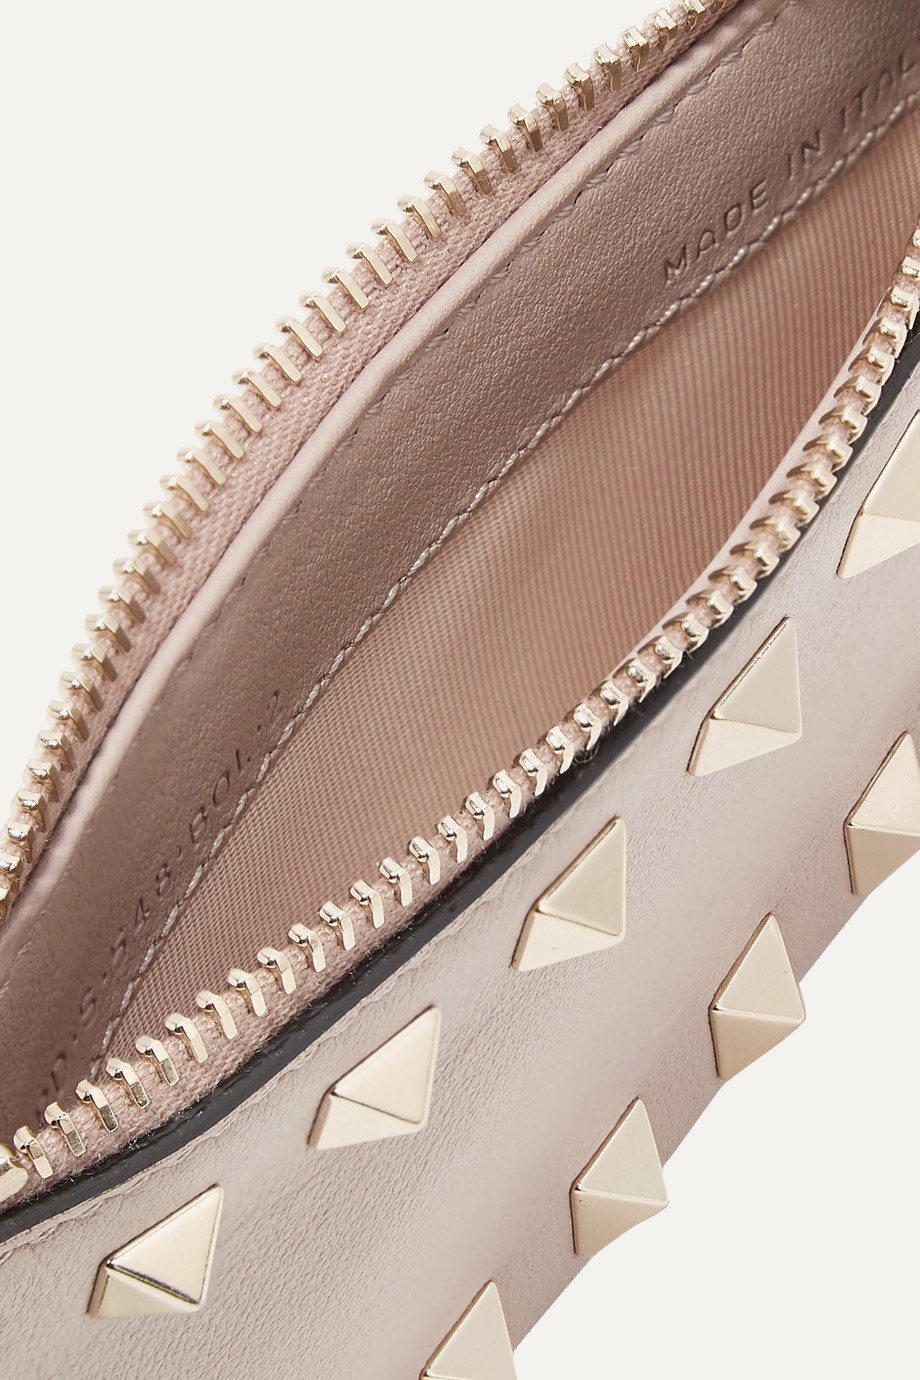 Valentino Valentino Garavani The Rockstud leather cardholder